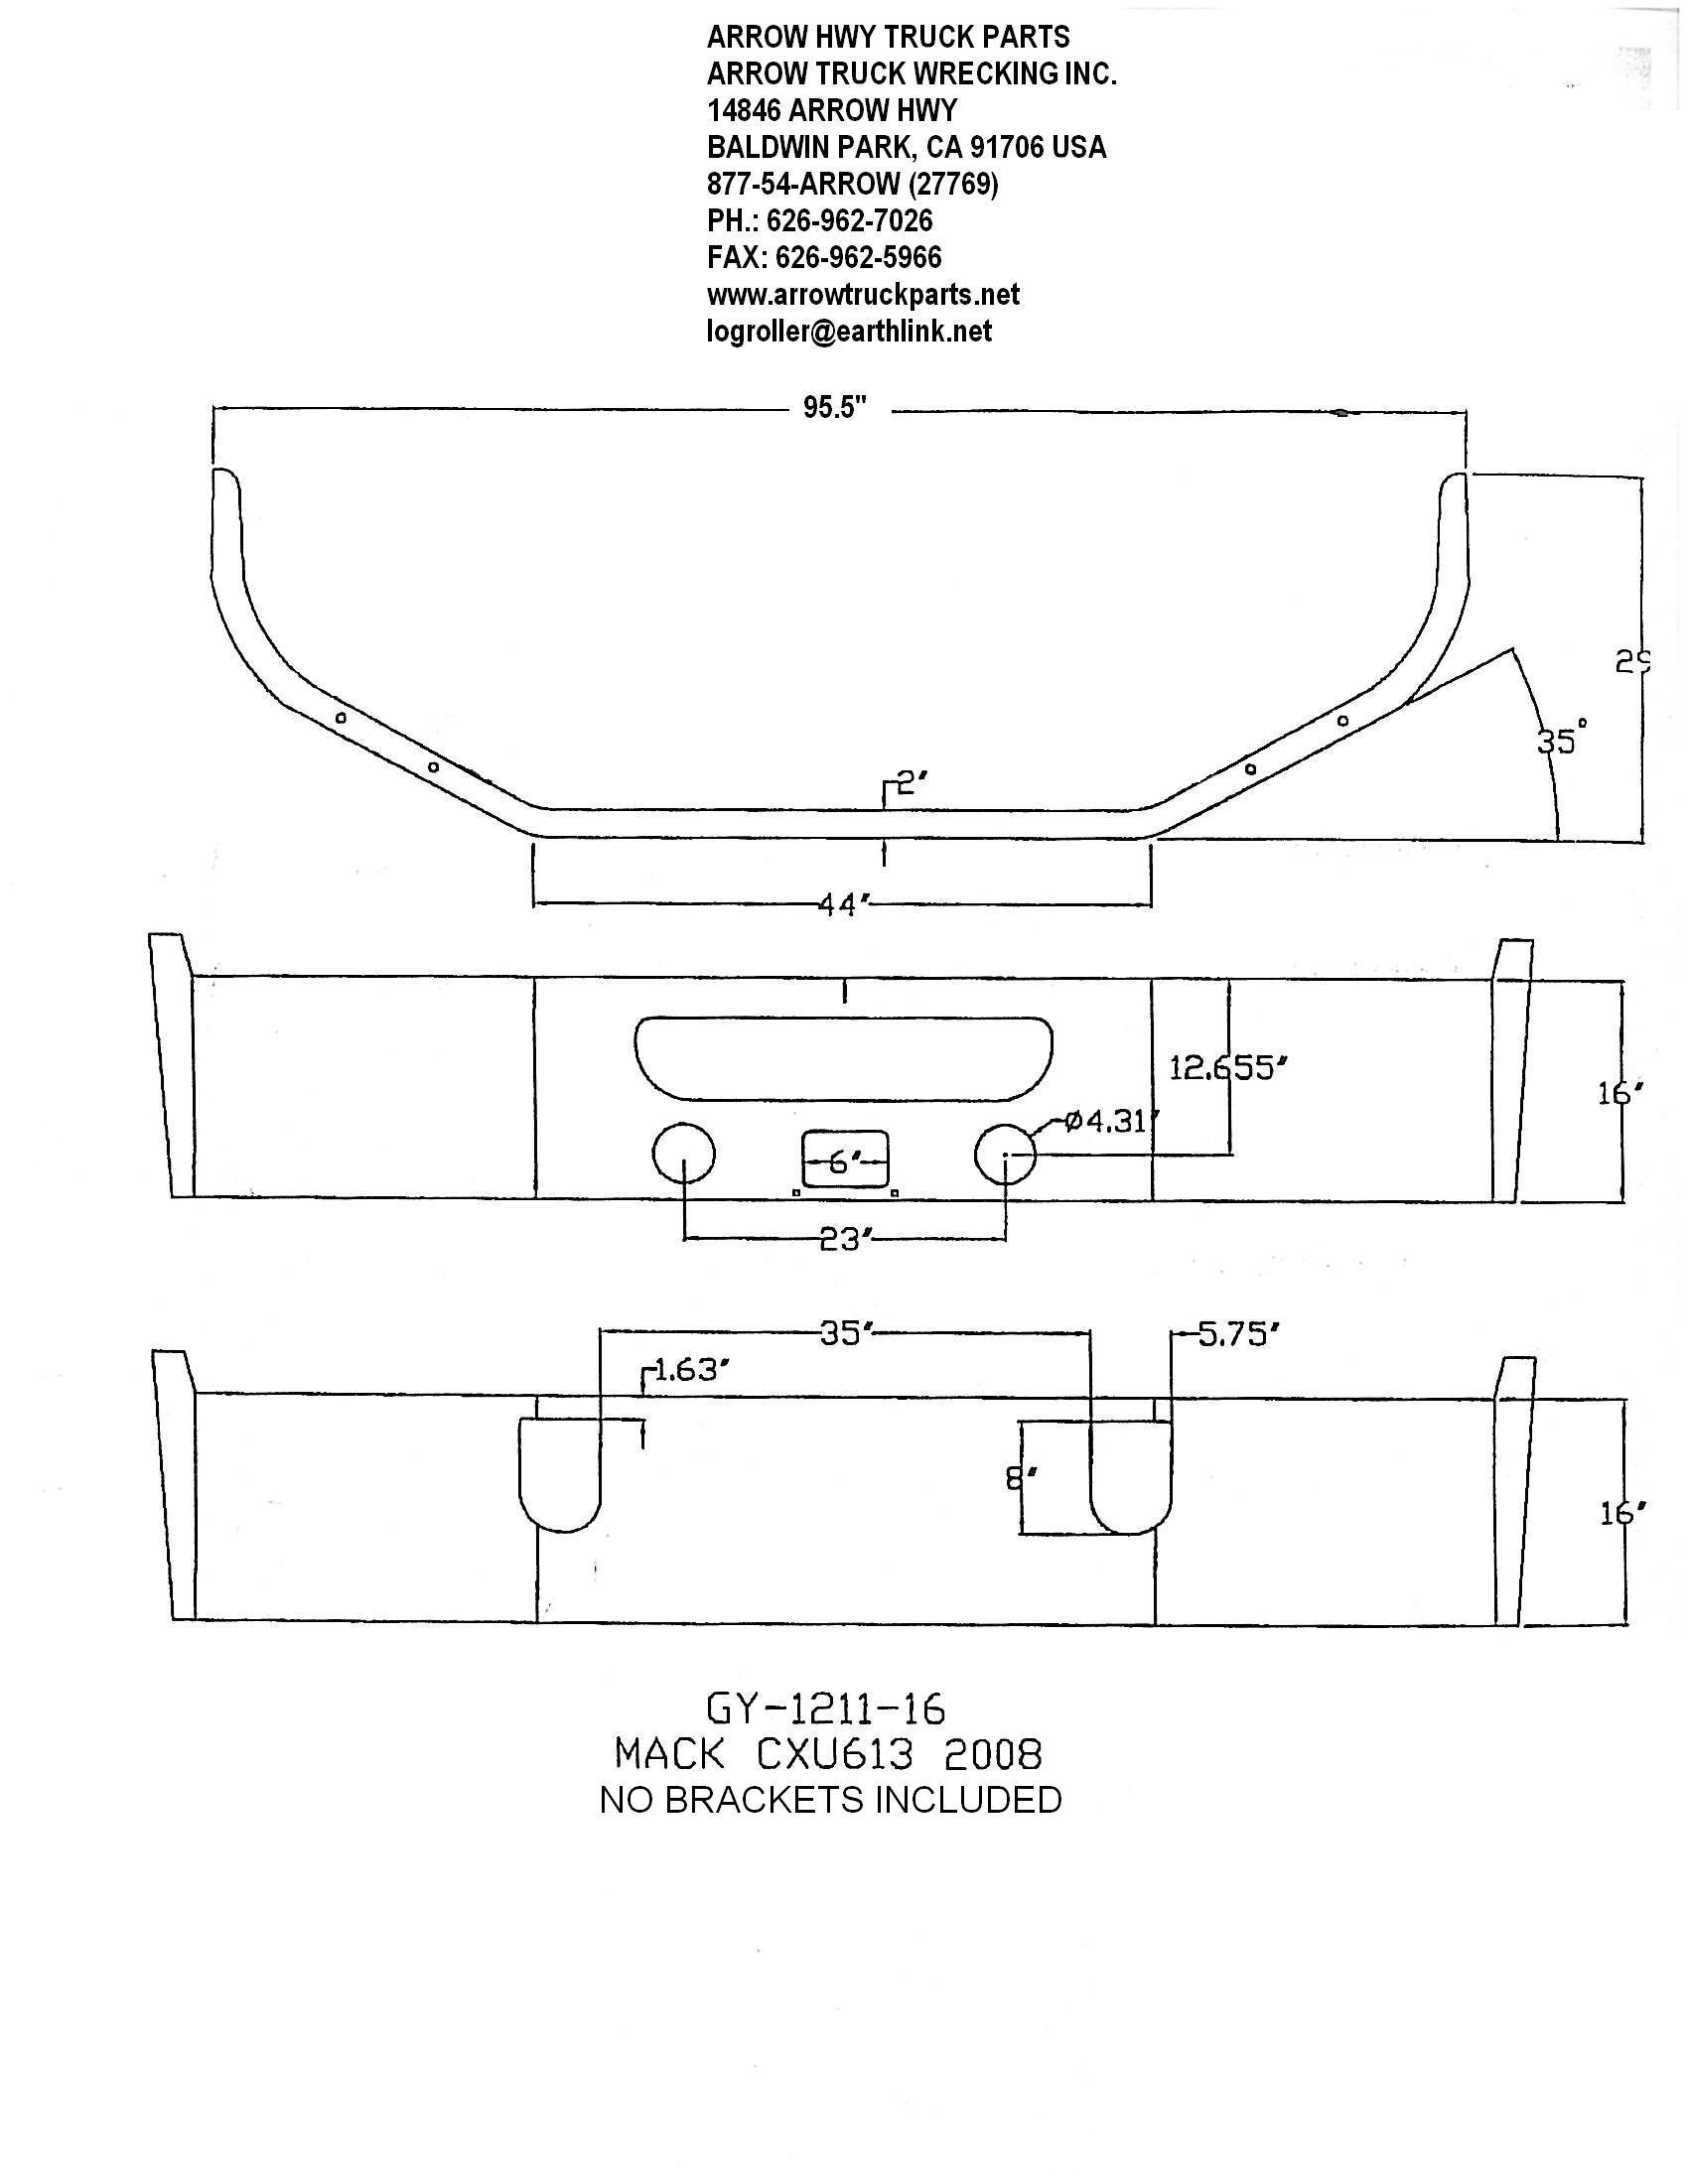 Wire Schematic For A Mack Cxu613 Million Wiring Diagram 2004 Cx613 Diagrams Pinnacle Chu613 Schemes